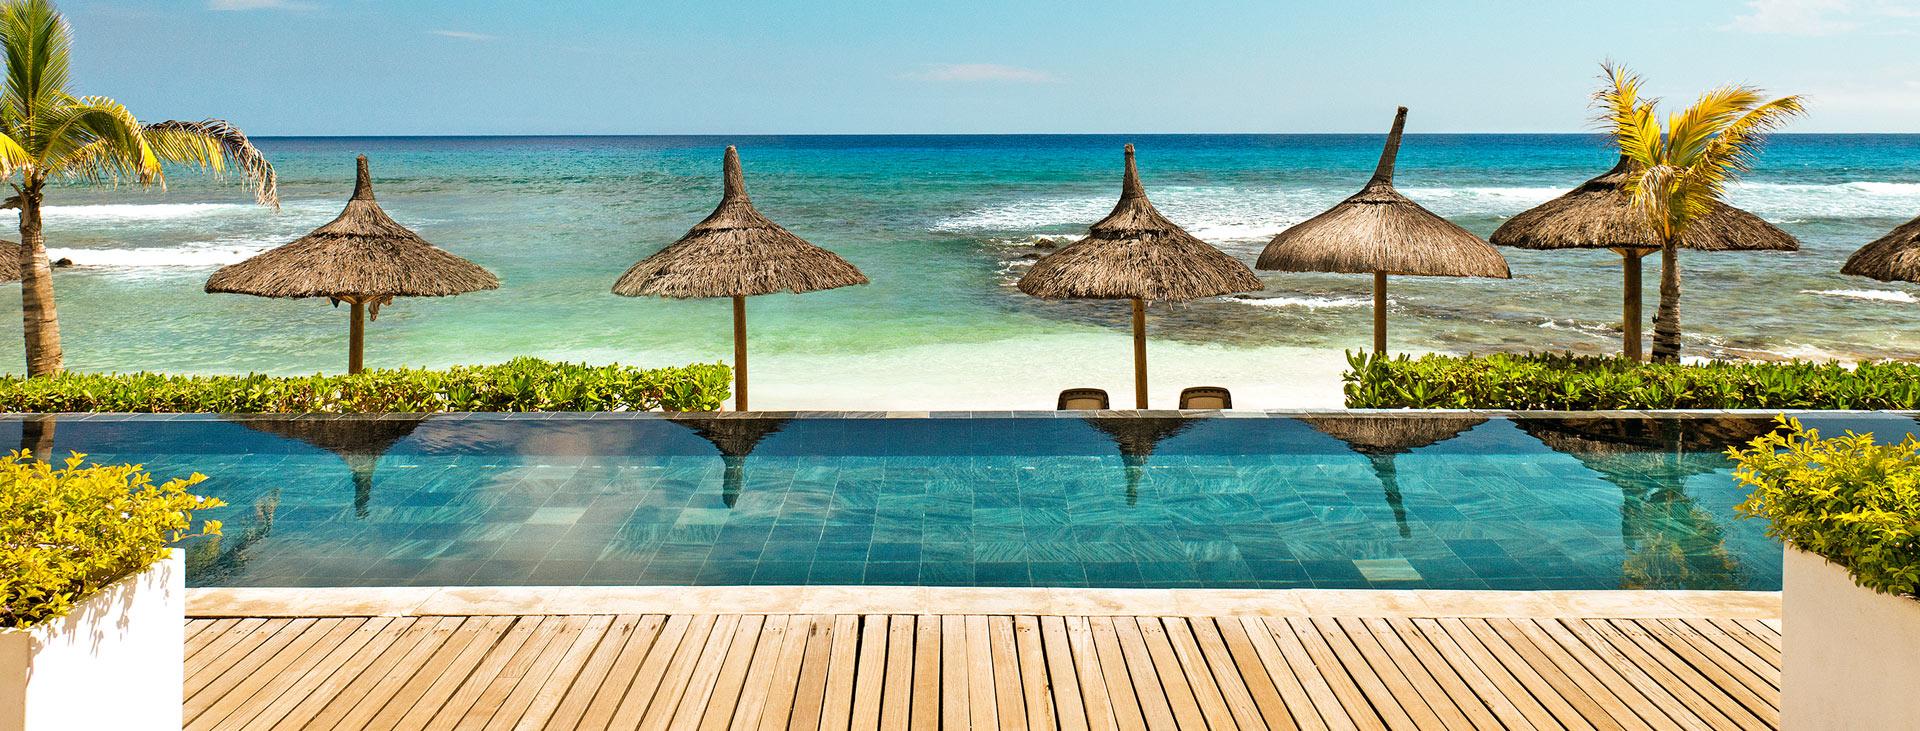 Récif Attitude Hotel, Mauritius, Mauritius